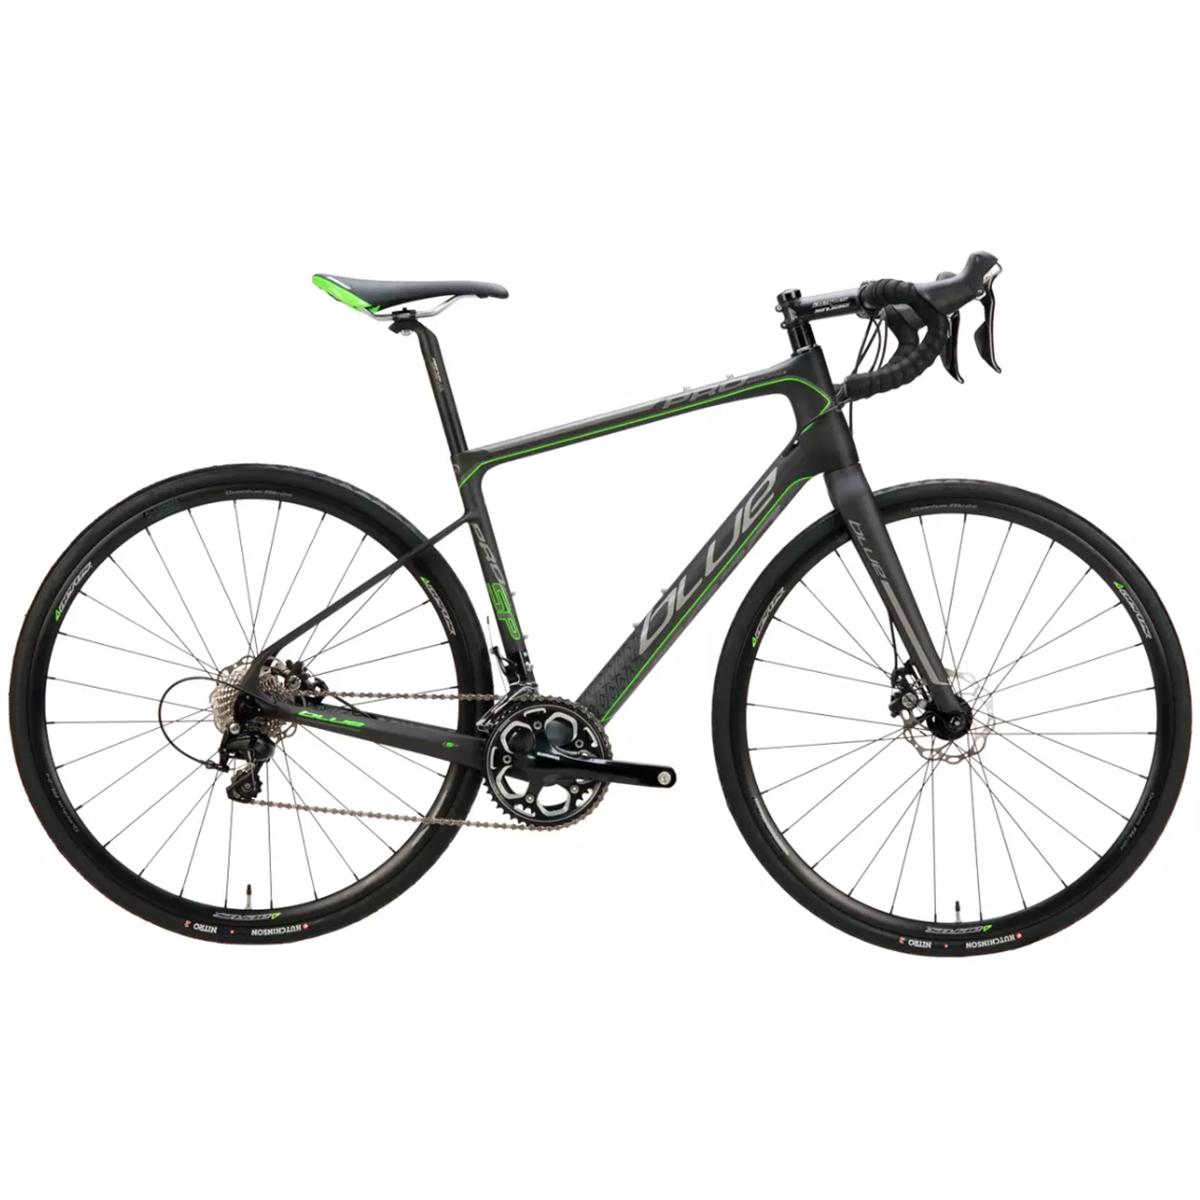 Blue Prosecco SP 105 Carbon Gravel Bike